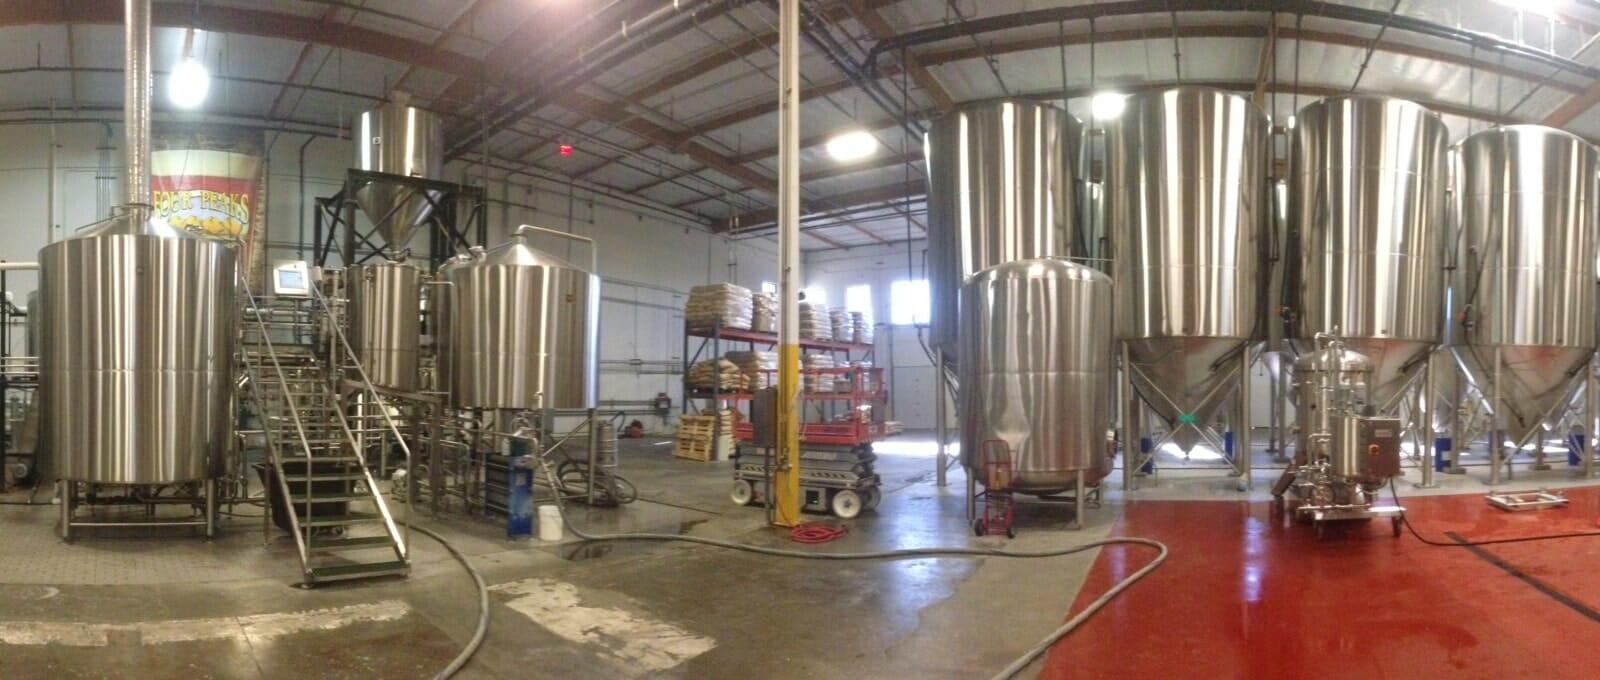 Four Peaks Brewery | Quality Control Lab